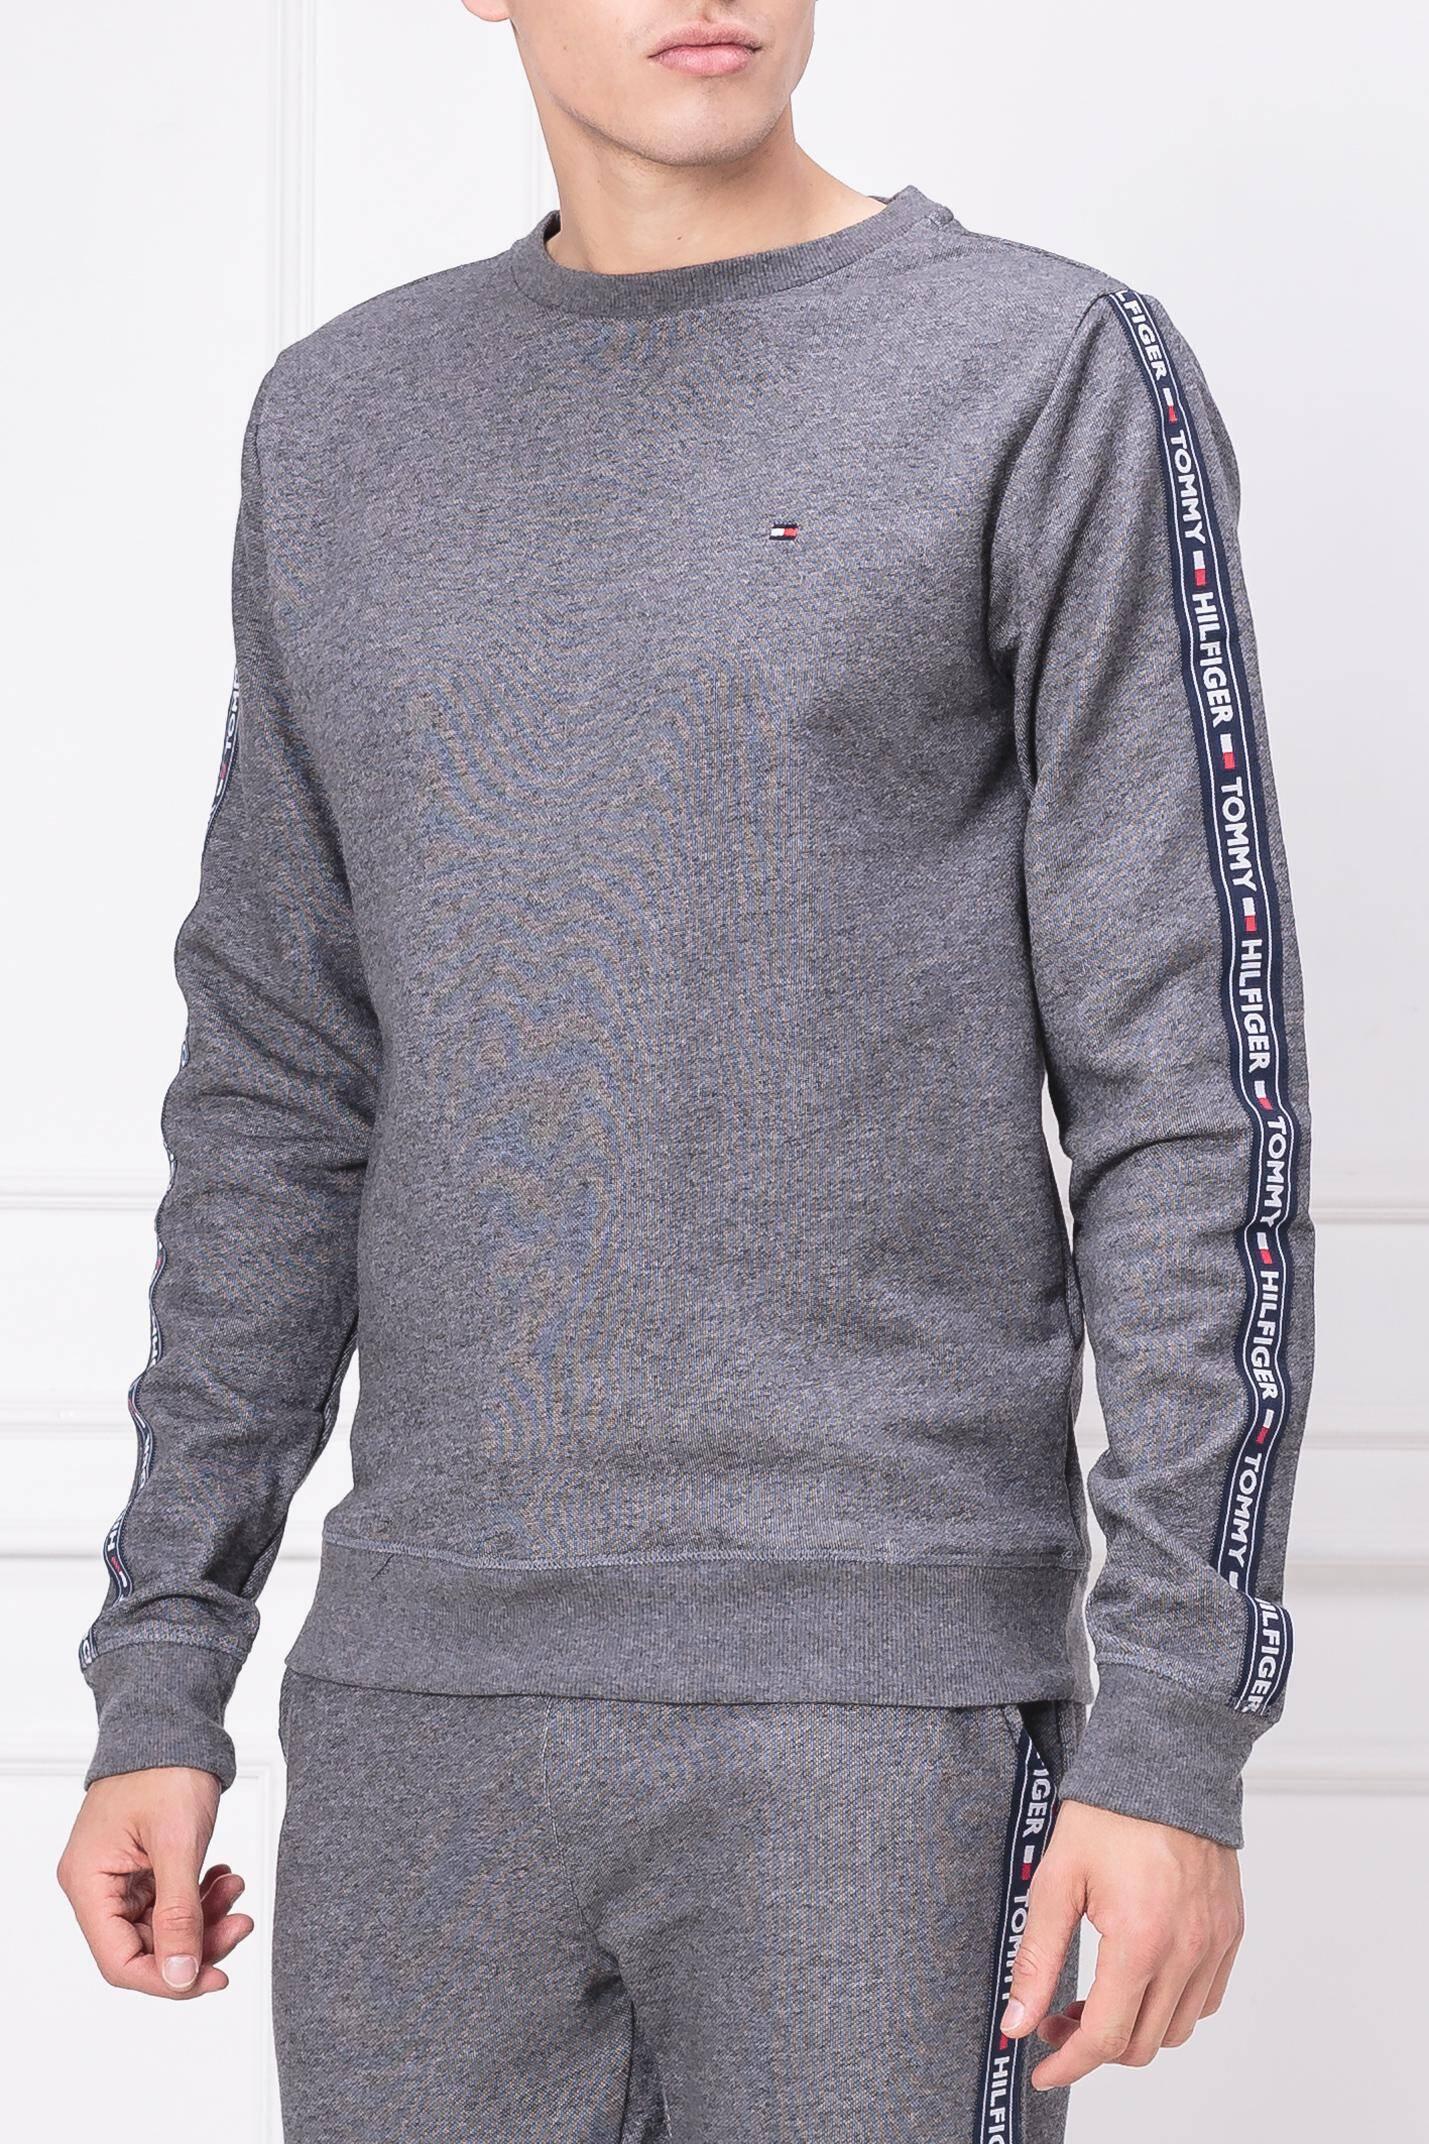 acac85ab5 Sweatshirt TRACK TOP LS HWK